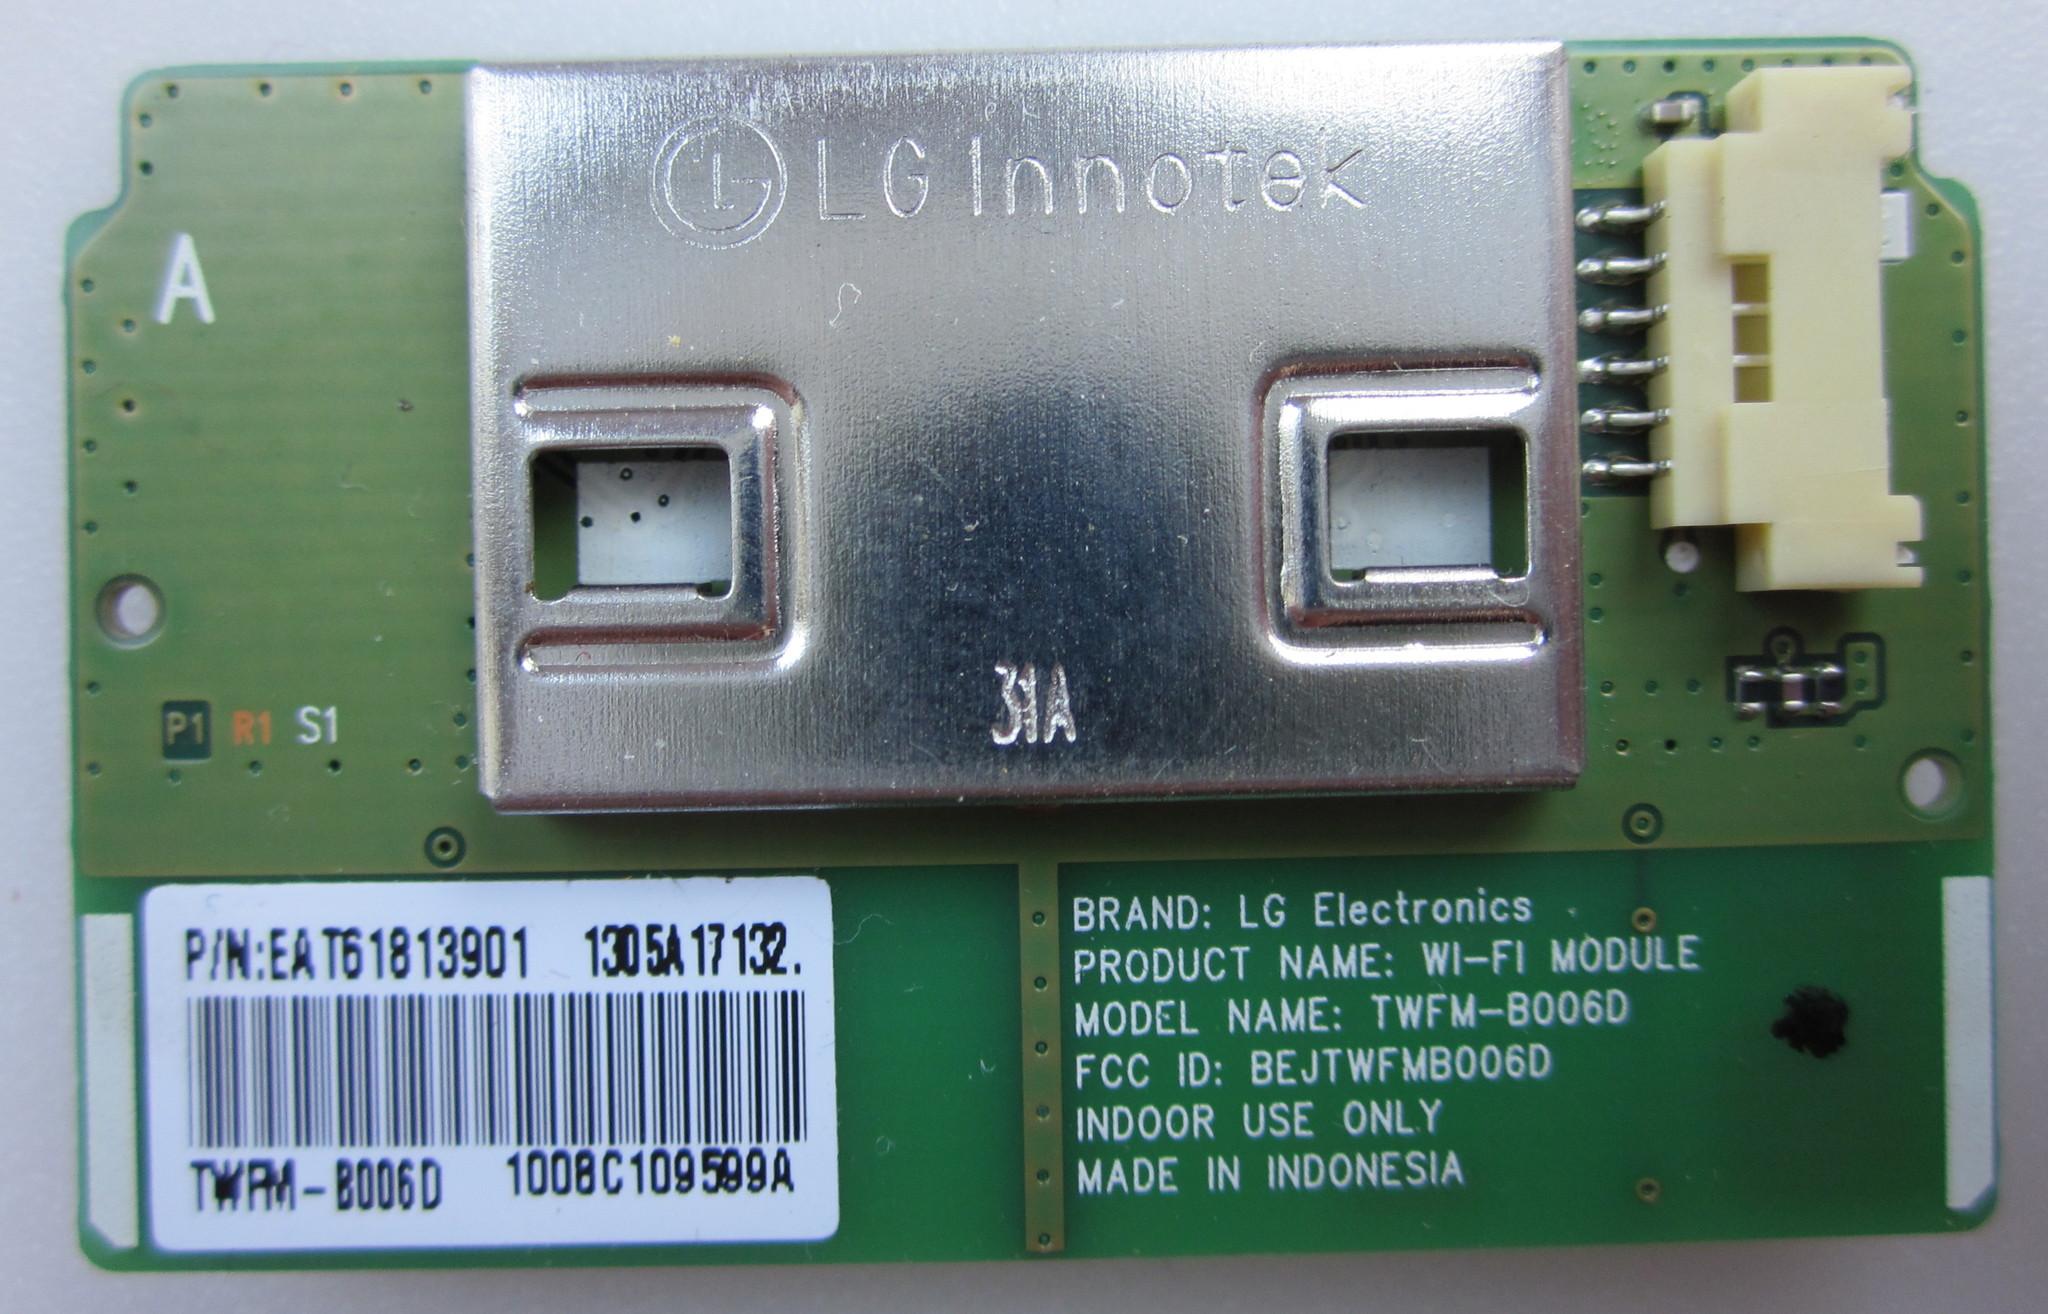 Wi-Fi MODULE TWFM-B006D